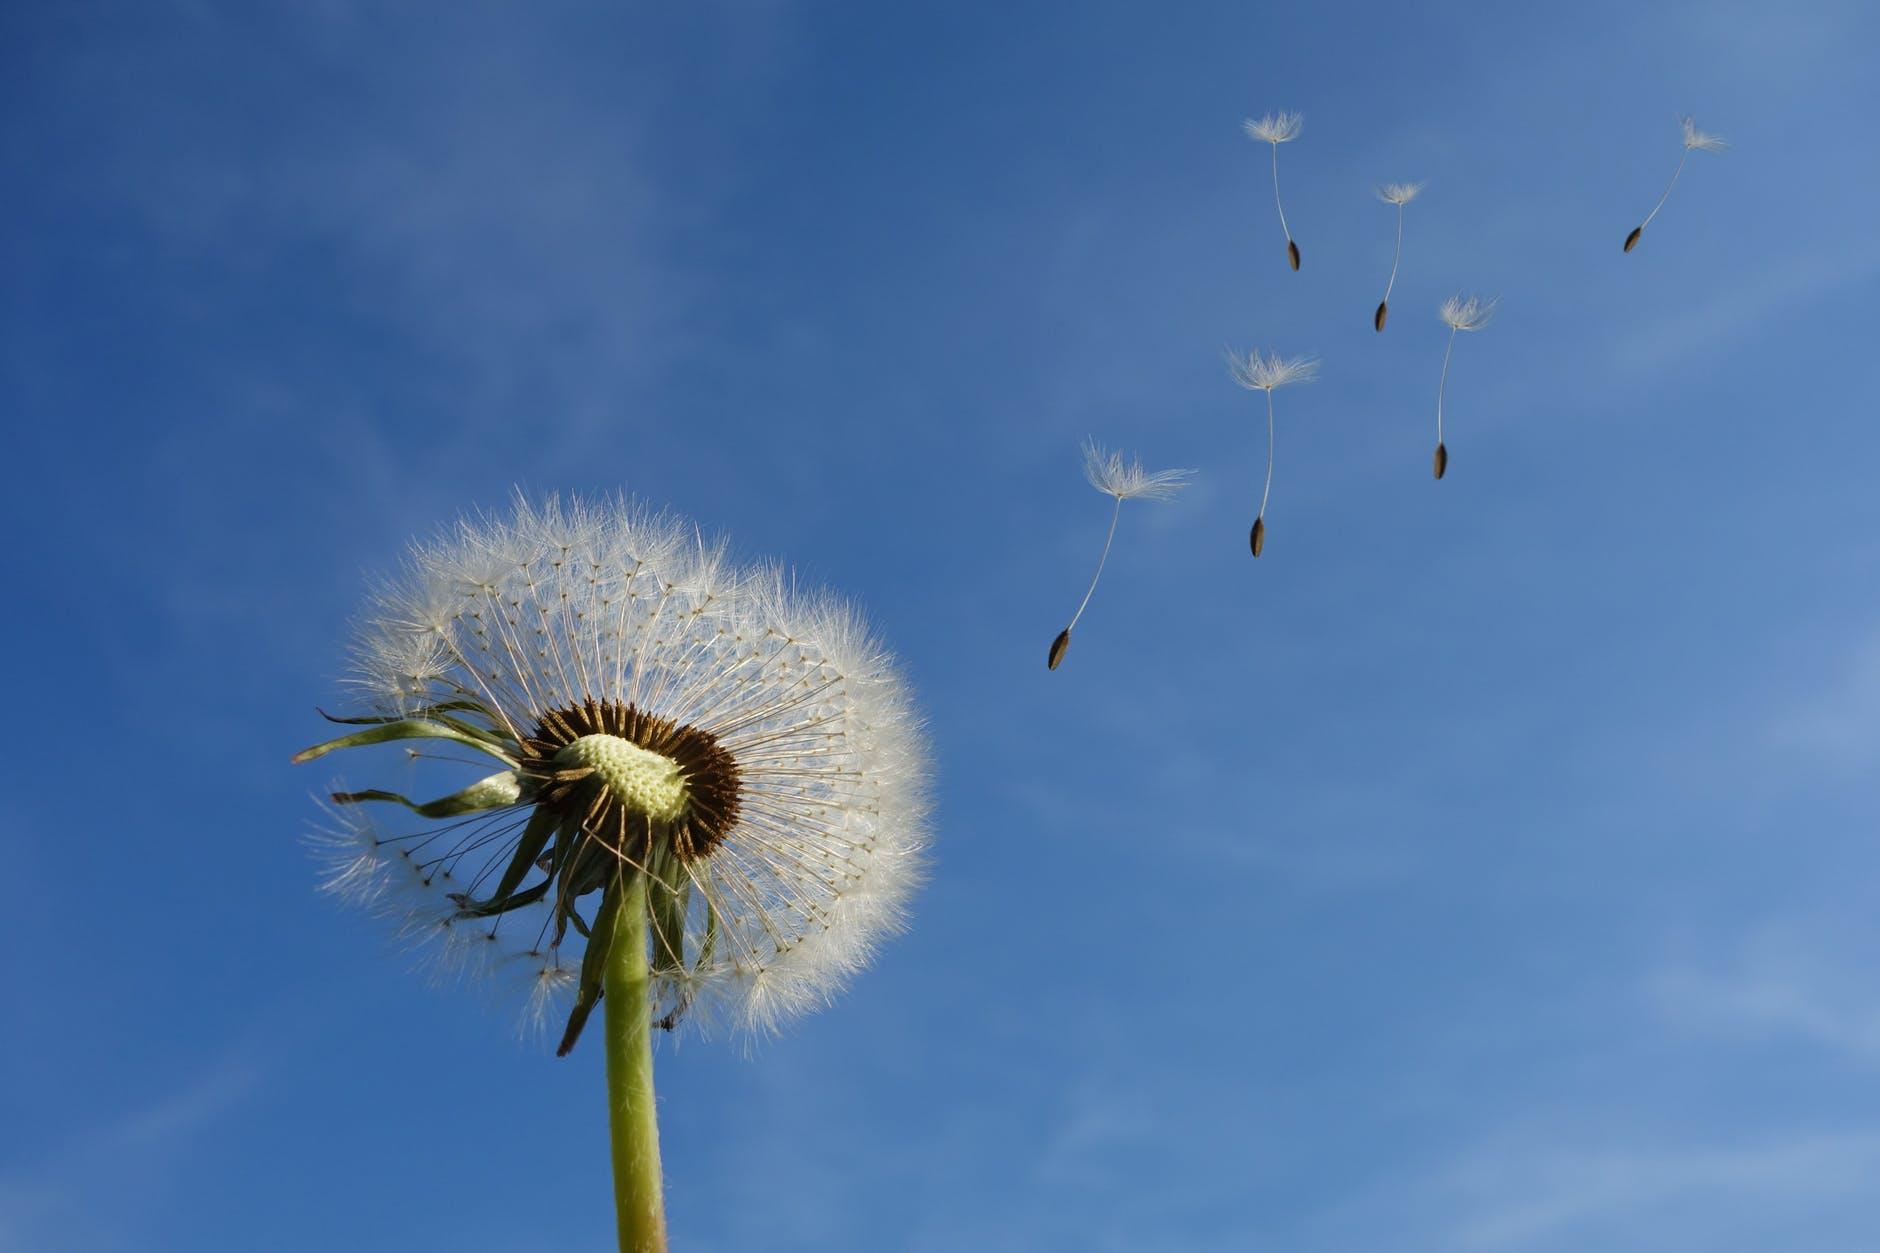 dandelion-sky-flower-nature-39669.jpeg